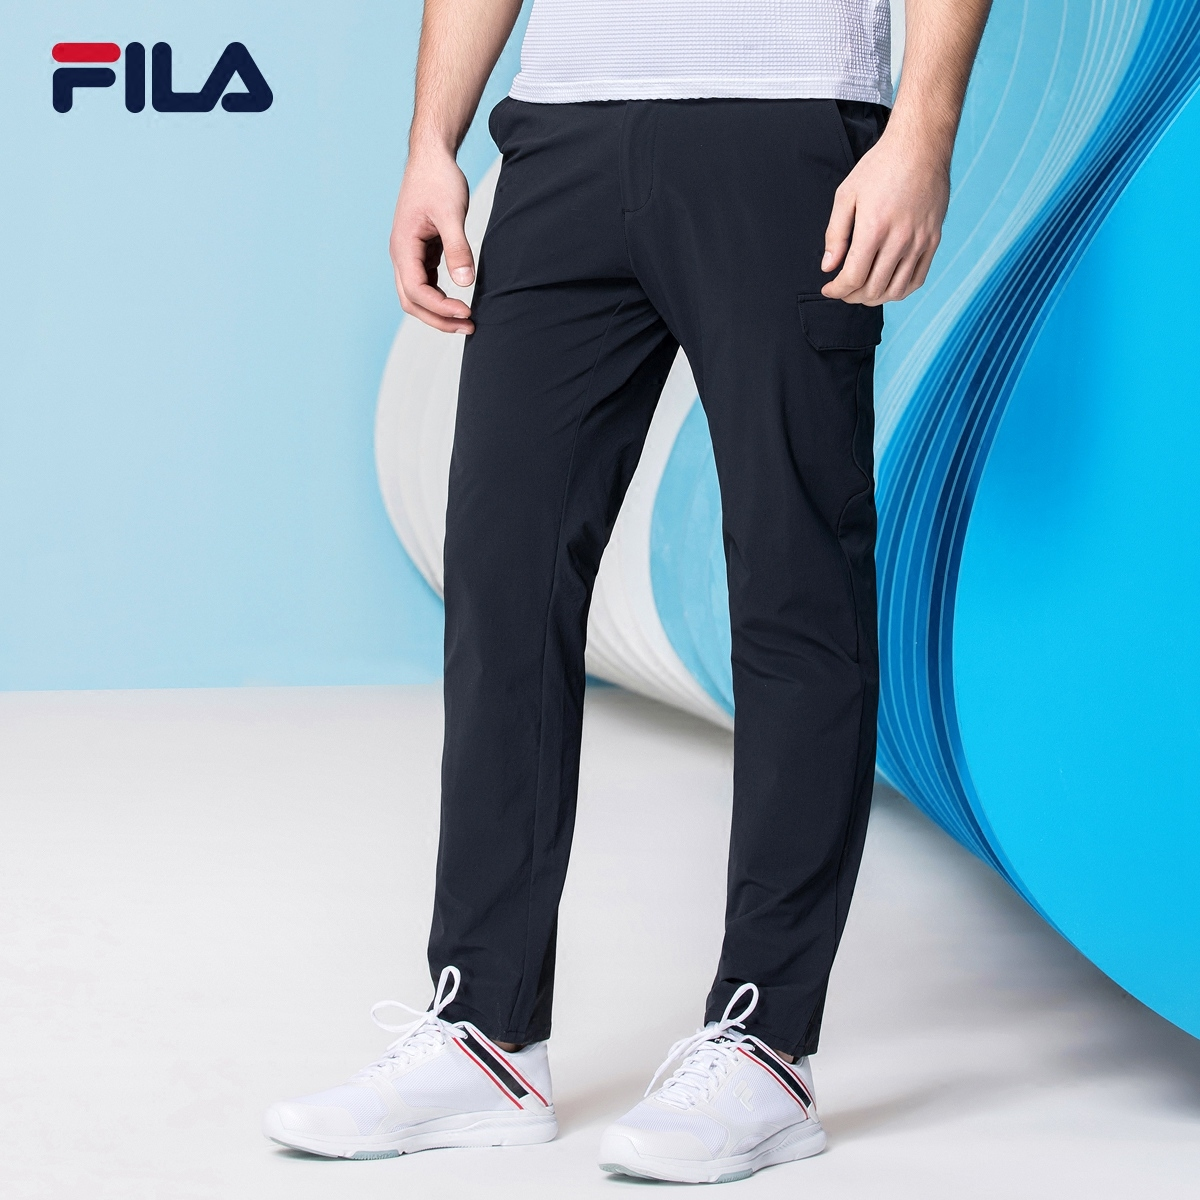 FILA斐乐高尔夫运动裤男2018官方正品新款商务优雅舒适运动长裤男